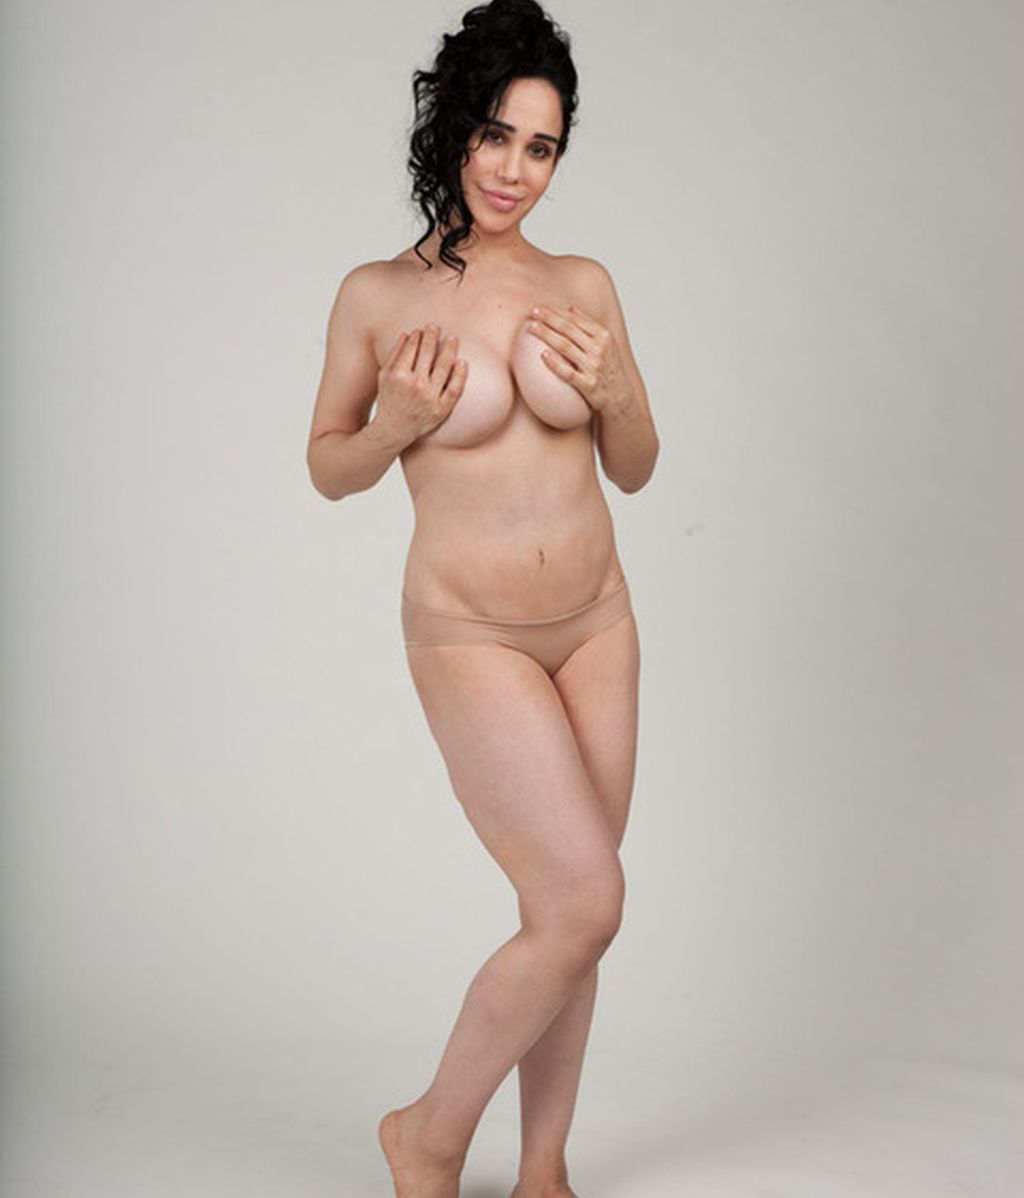 Se desnuda para el novio